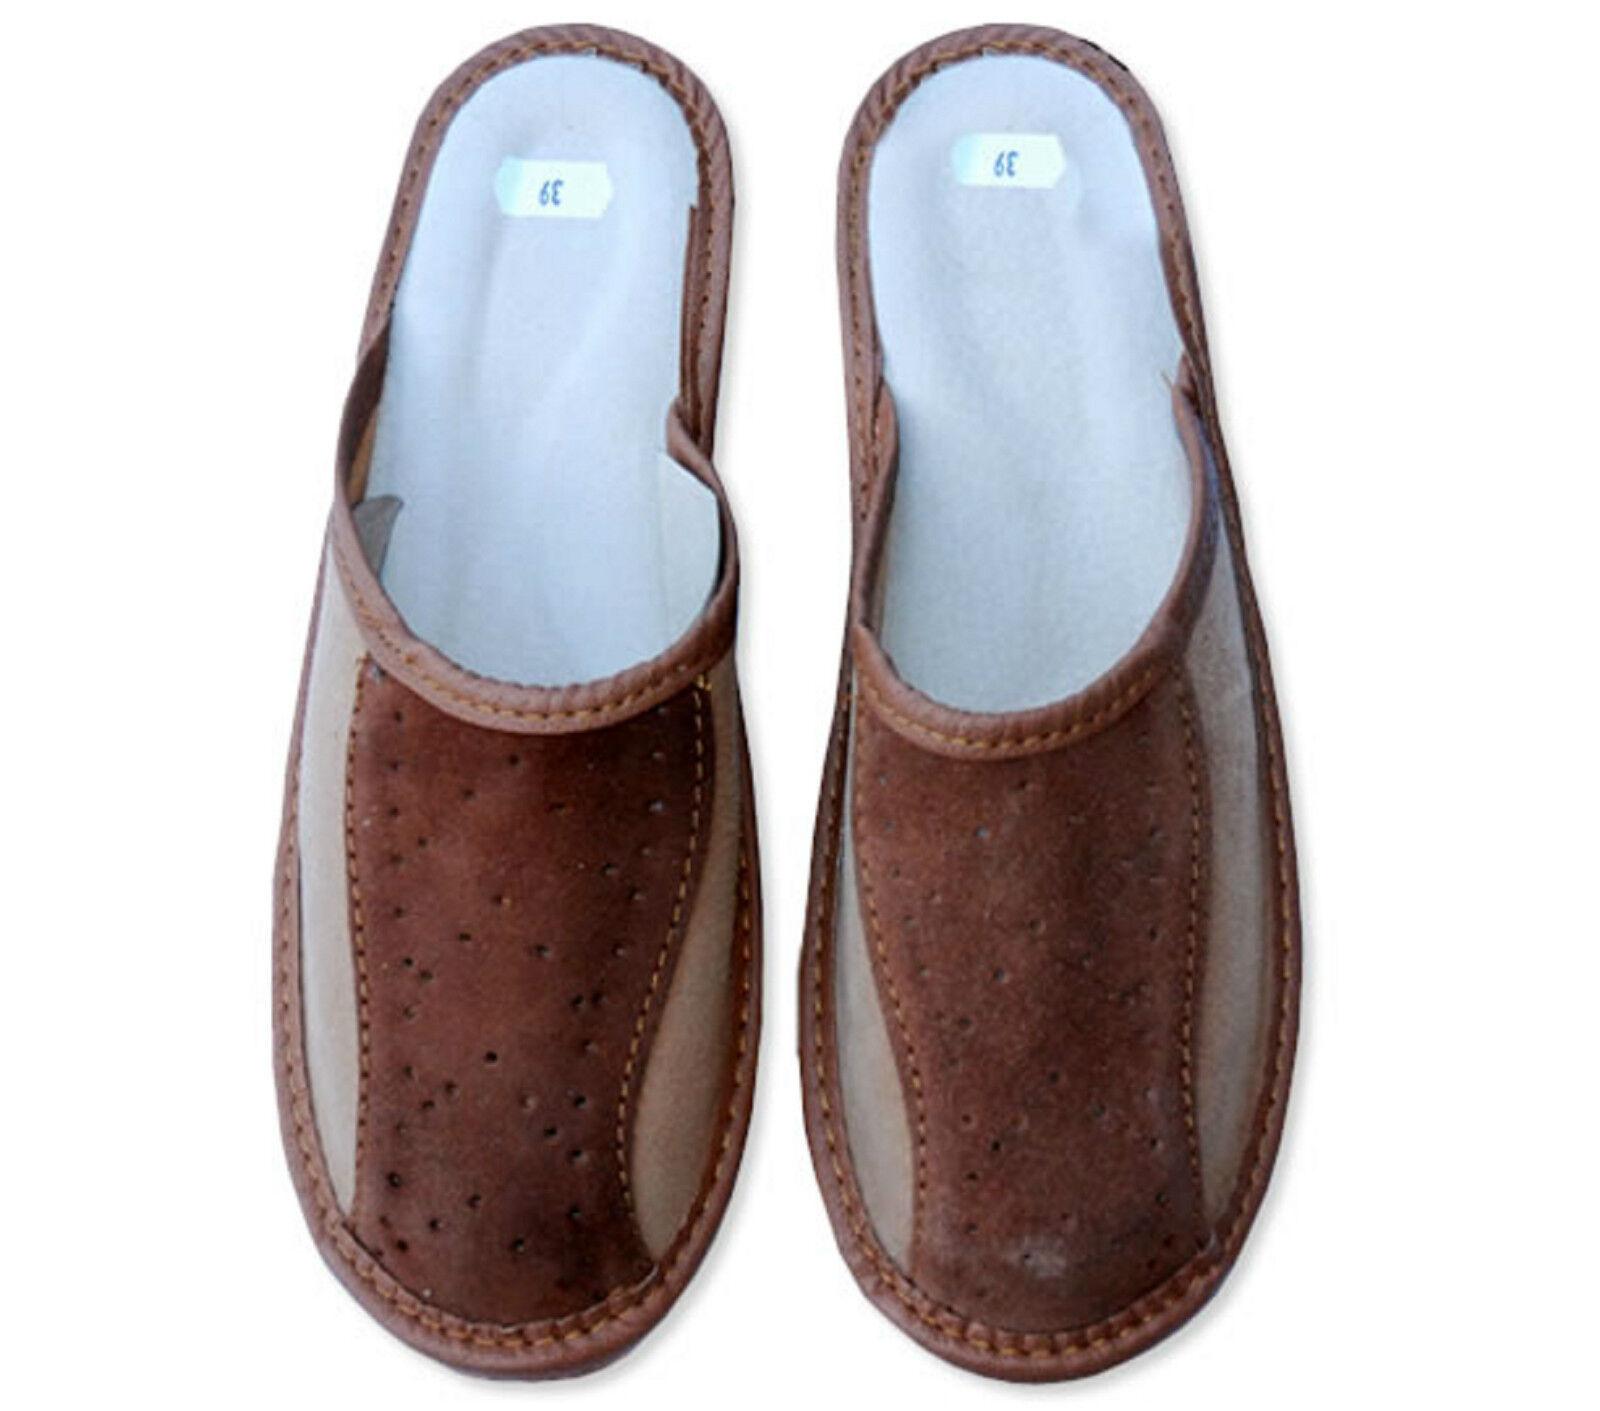 New Men's  boy men Brown Leather Slippers mule H Q     OFERR    2